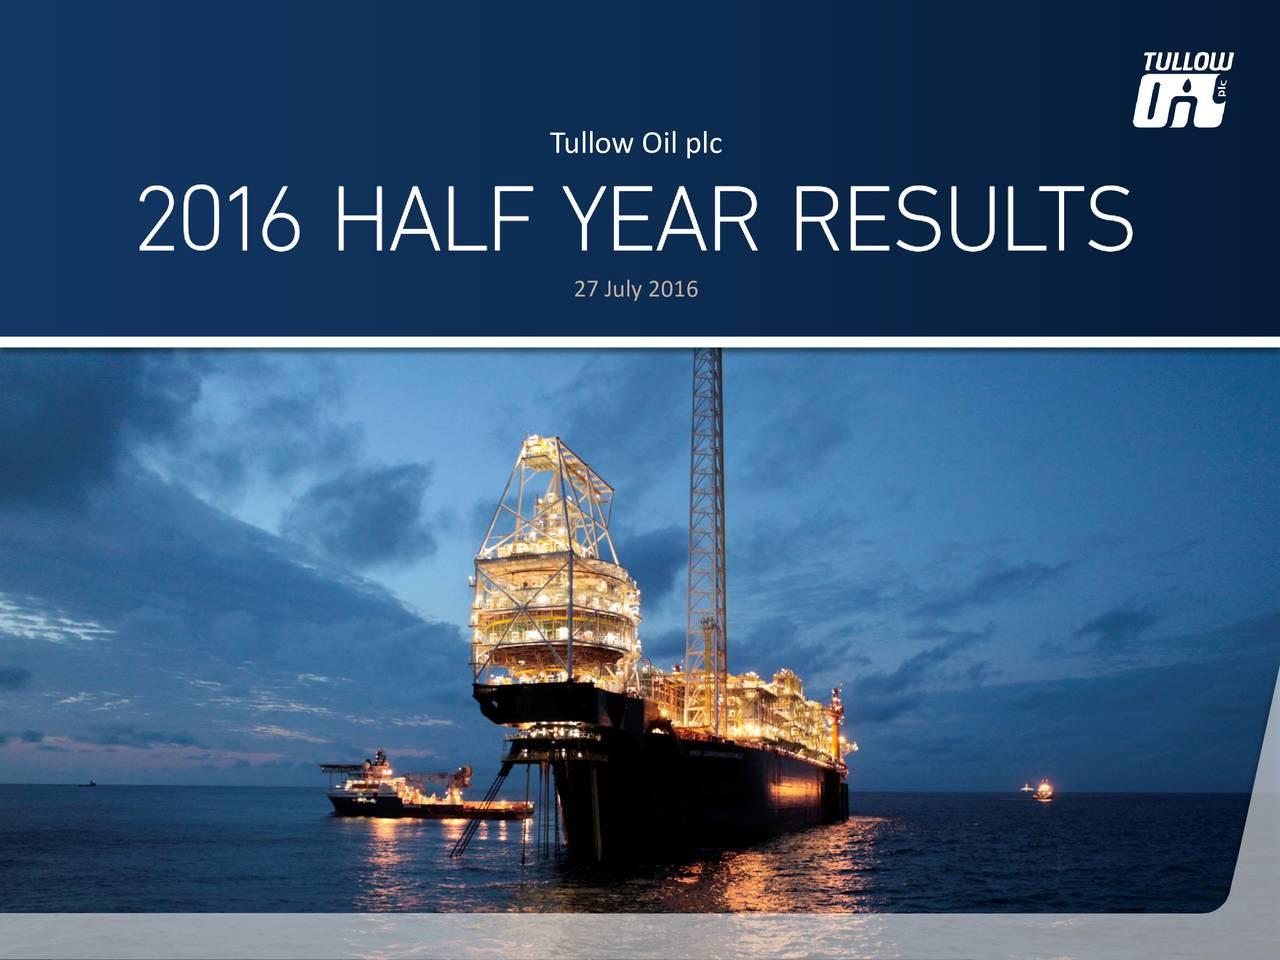 Tullow Oil plc 27 July 2016